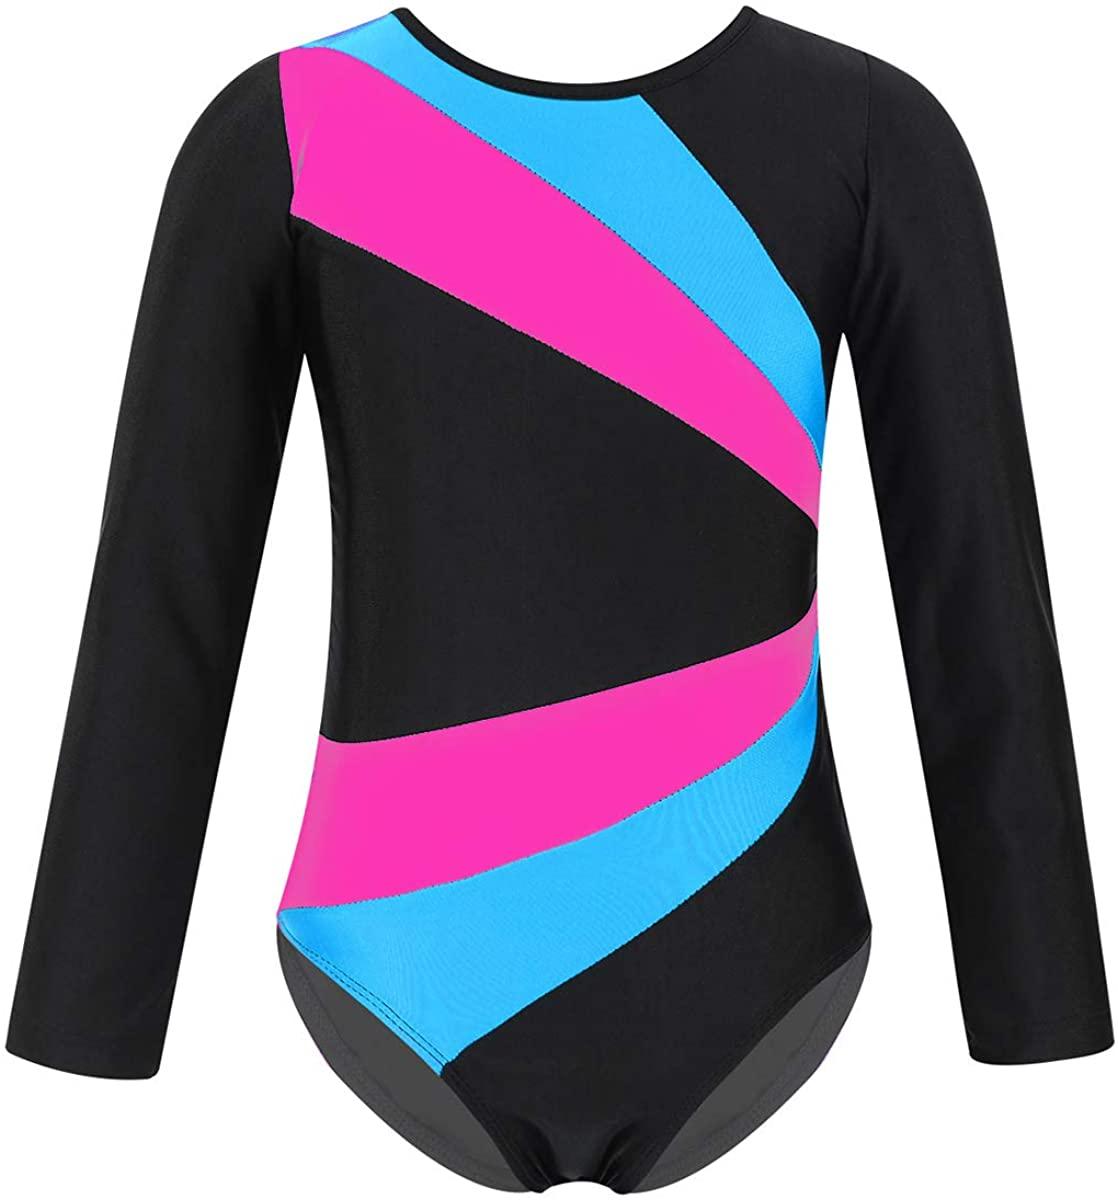 QinCiao Kids Girls Long Sleeve Twist Back Geometric Printed Gymnastics Leotard Bodysuit Athletic Sports Dance wear Shirt